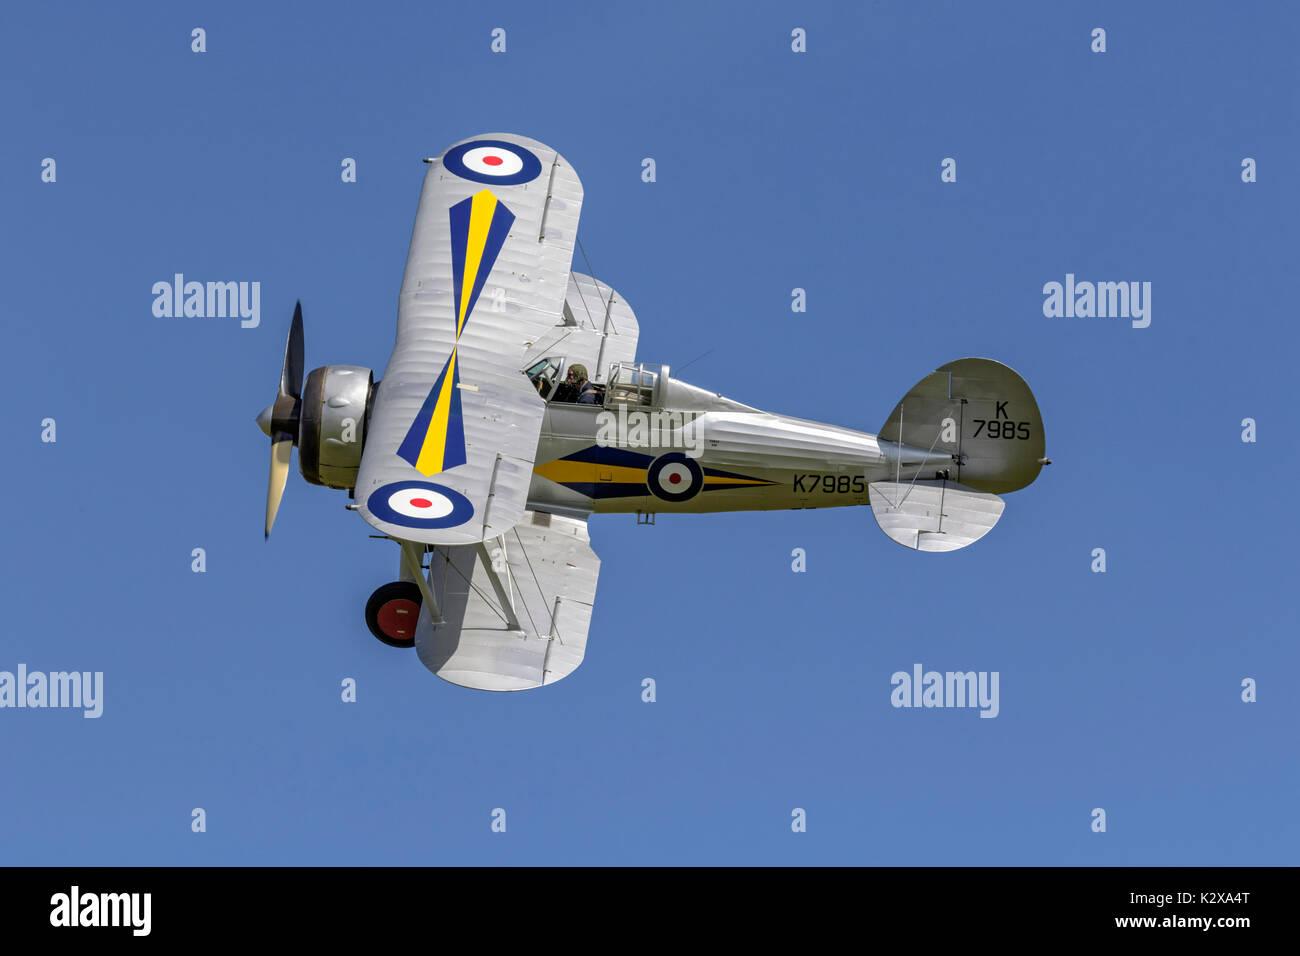 Gloster Gladiator - RAF bi-plane fighter - Stock Image